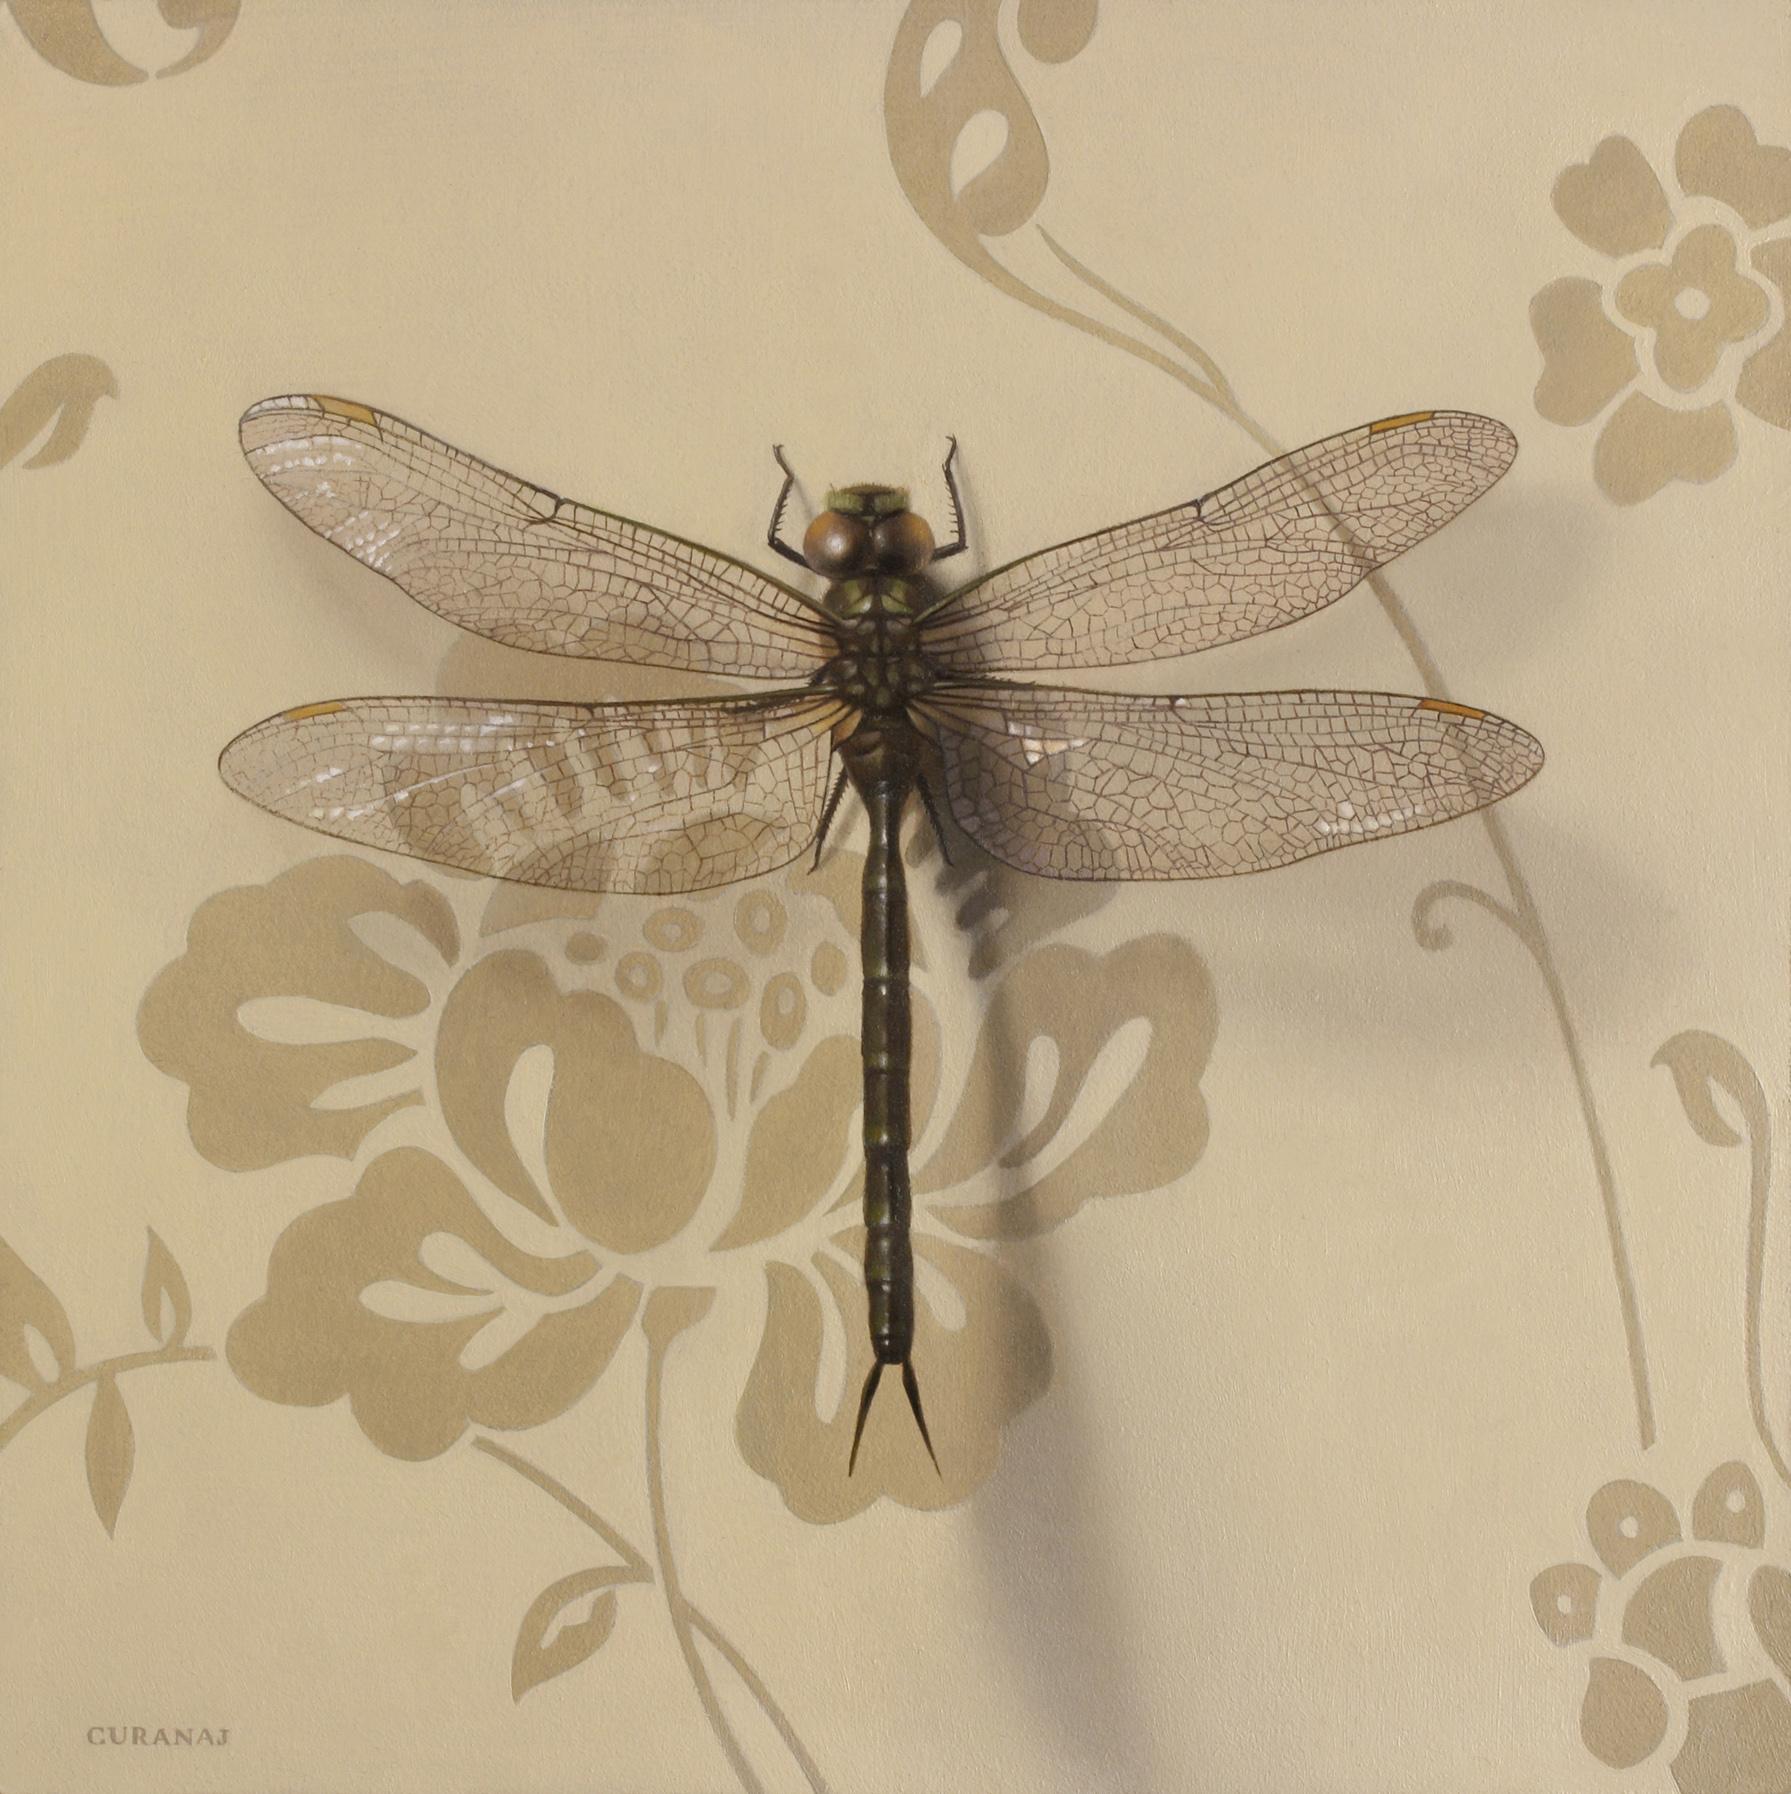 Born a Dragonfly